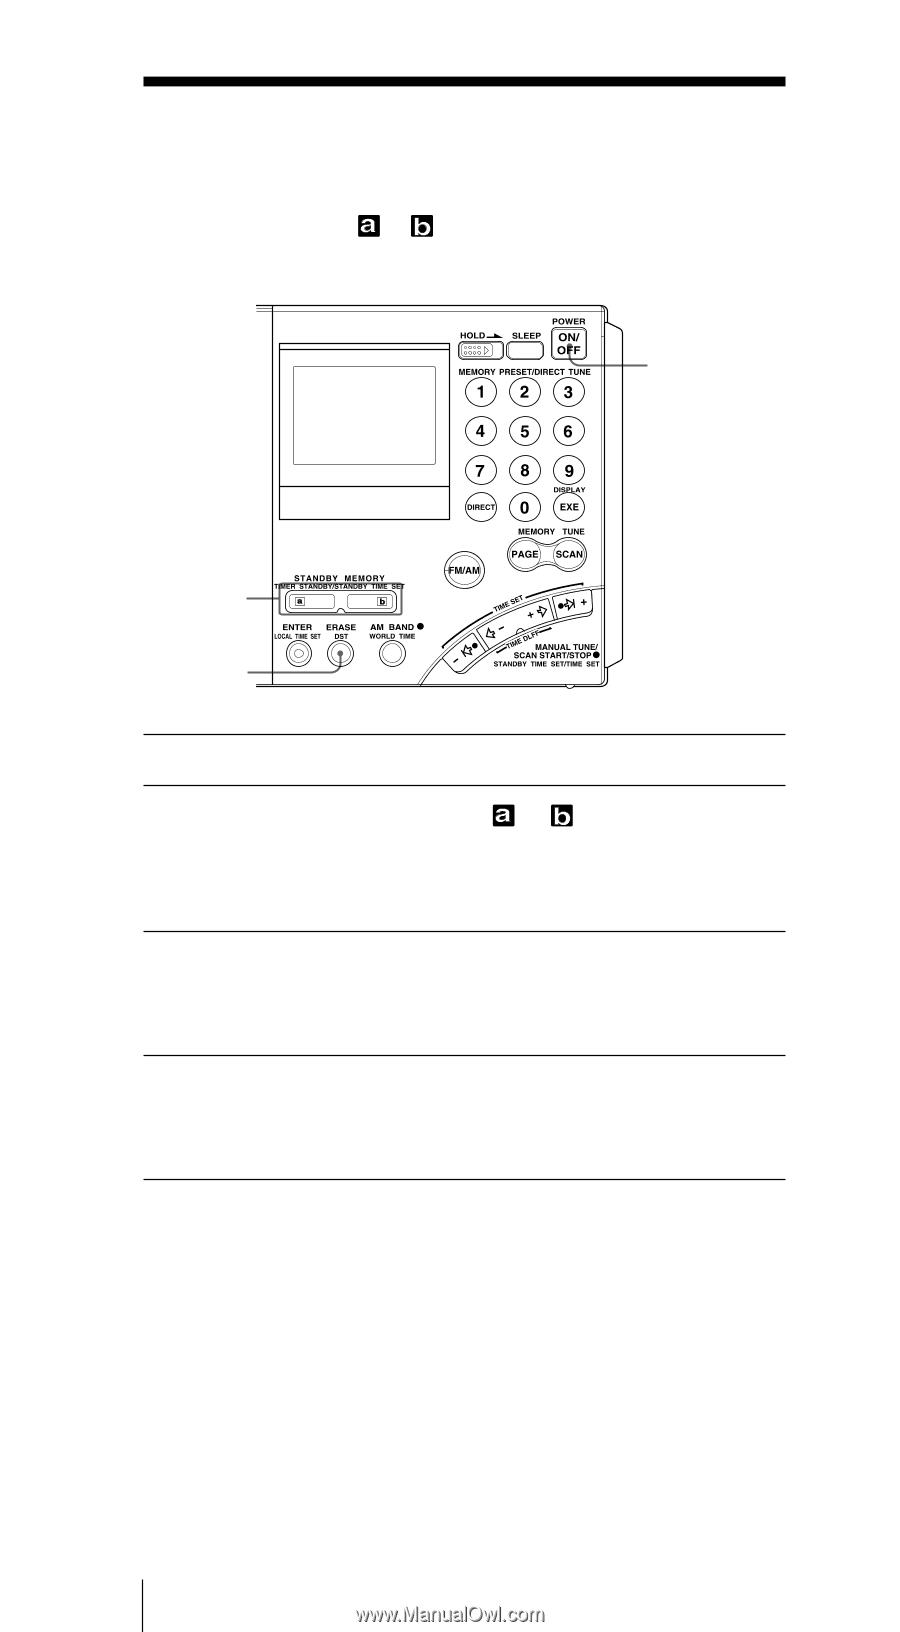 sony icf sw7600gr manual pdf rh sony icf sw7600gr manual pdf thepivotpoint us